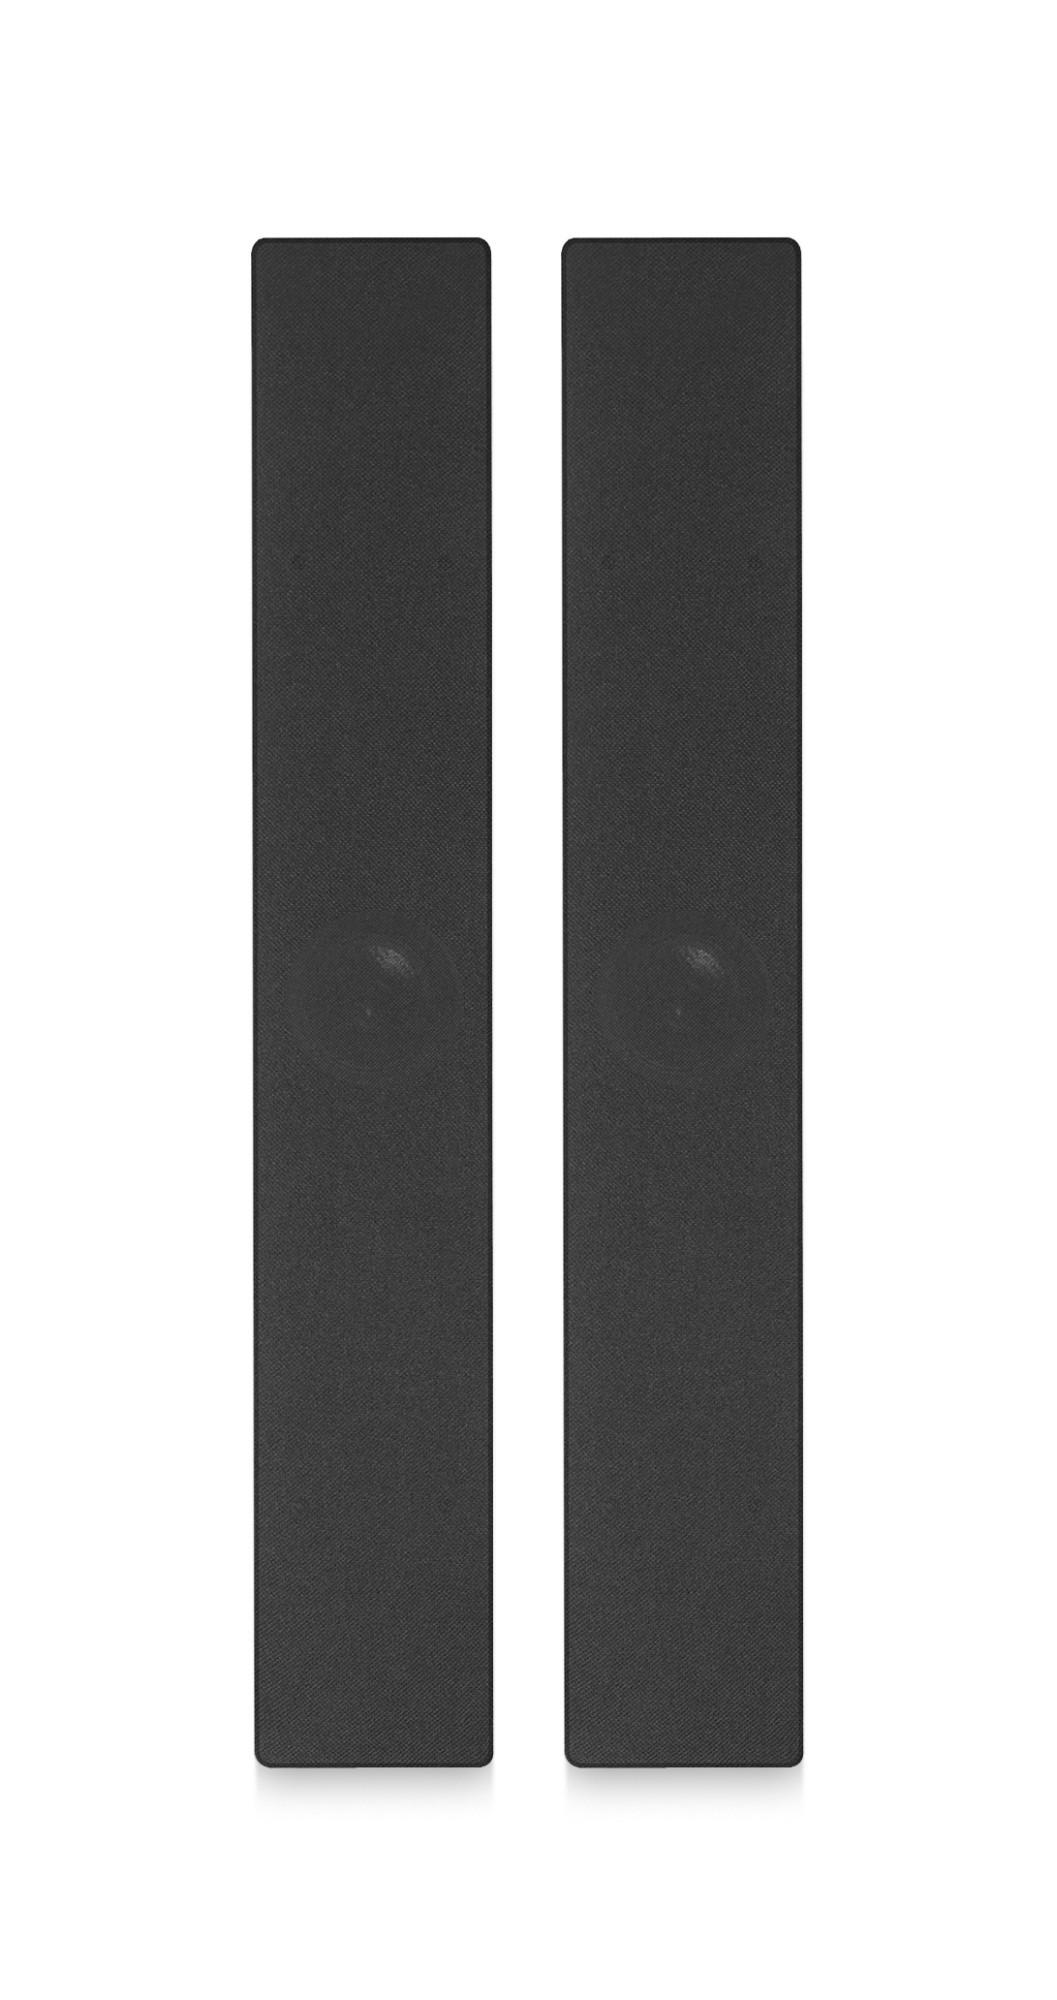 NEC SP-554SM 40W Black loudspeaker